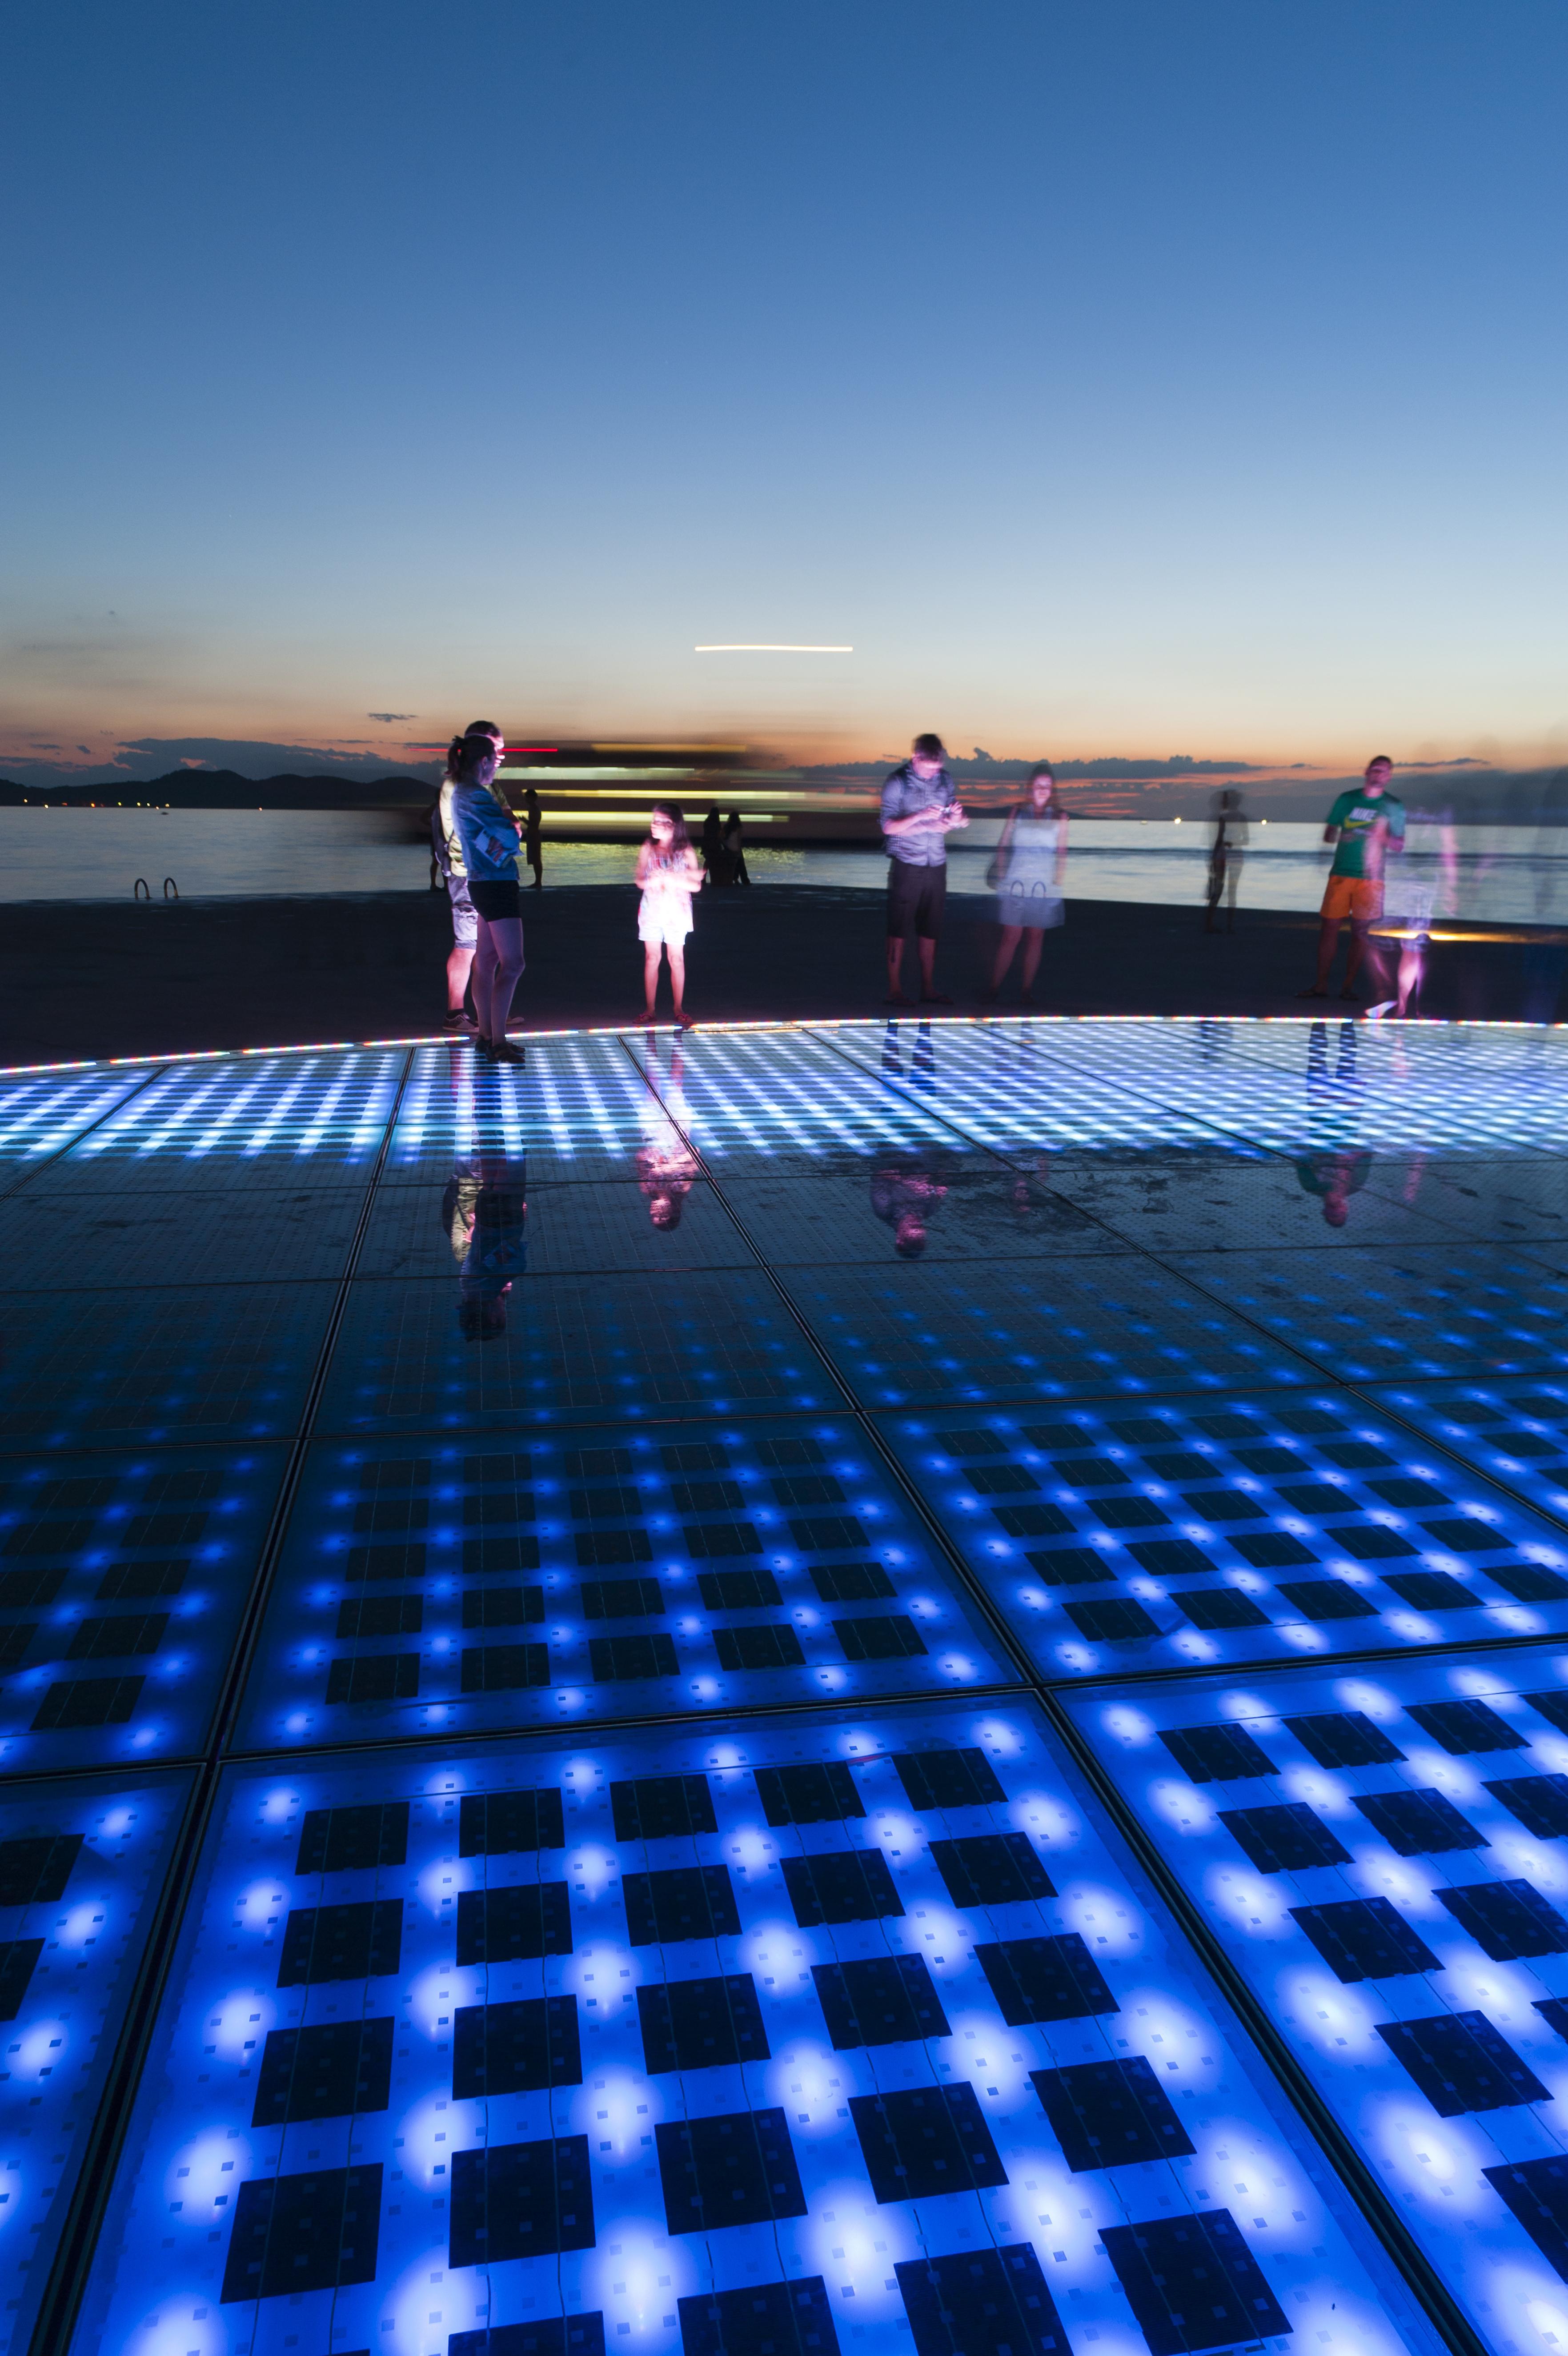 Sun Salutation  Zadar, Croatia Attractions - Lonely Planet